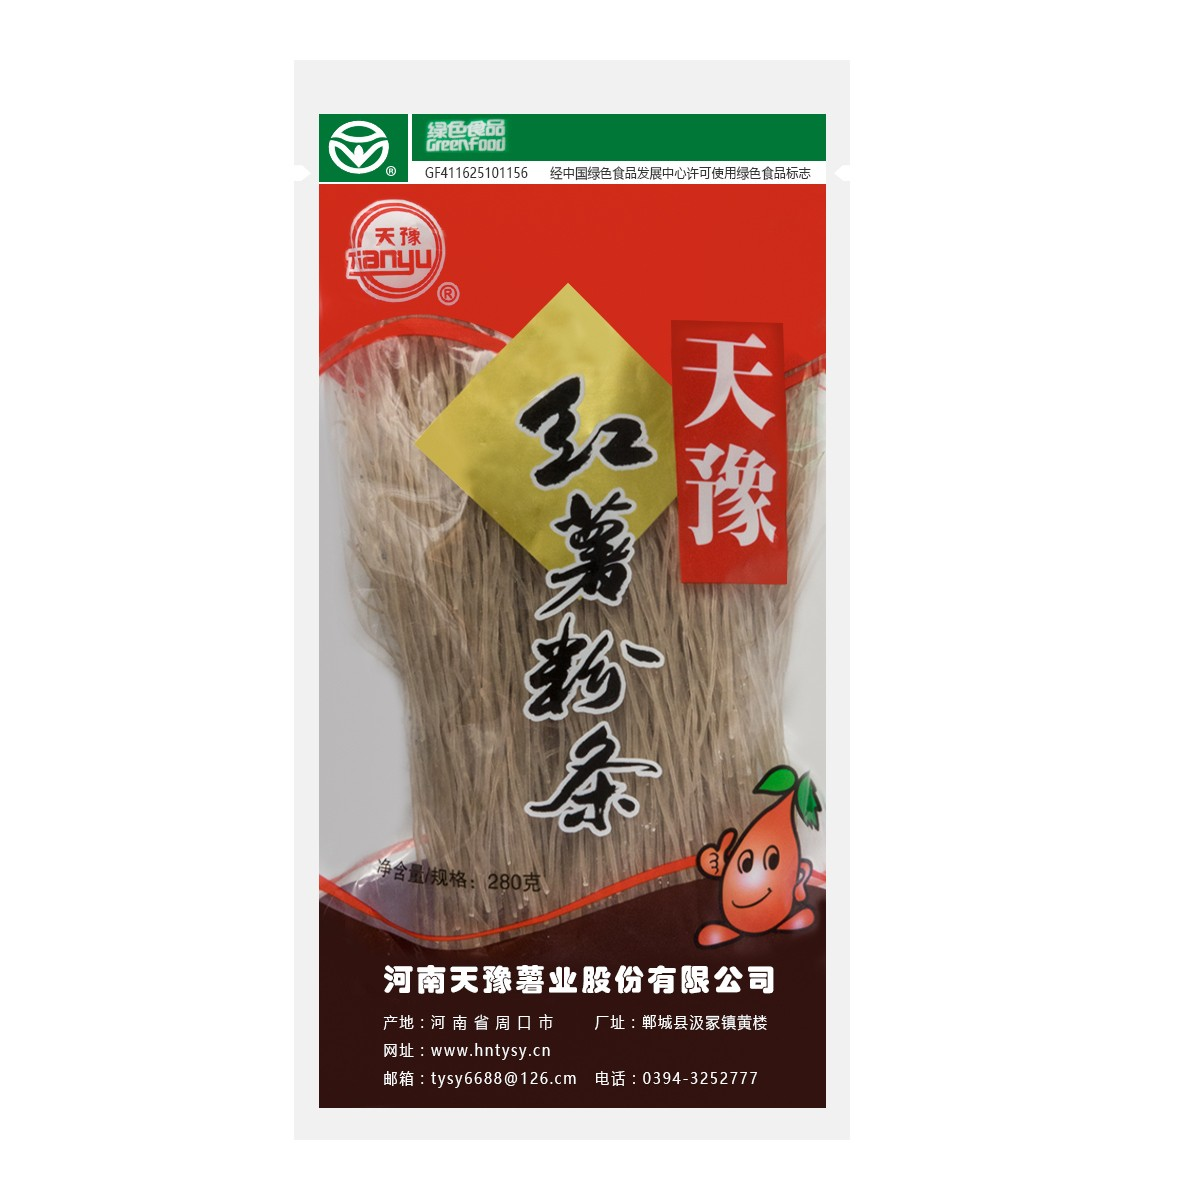 TIANYU Potato Starch Vermicelli 280g